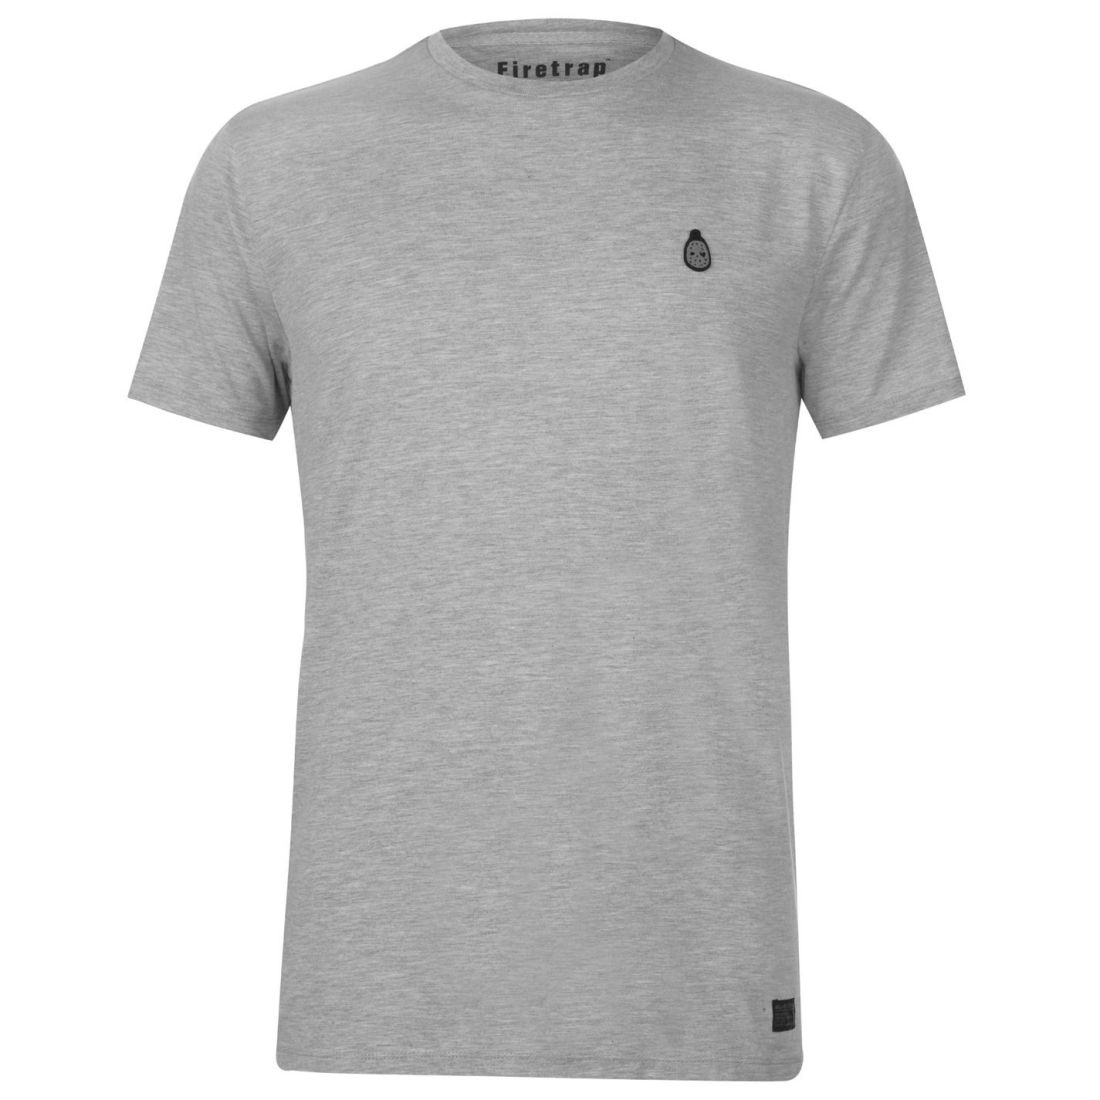 Firetrap Blackseal Gnome Crew T Shirt Uomo Gents Neck Tee Top Cotone Regular Fit